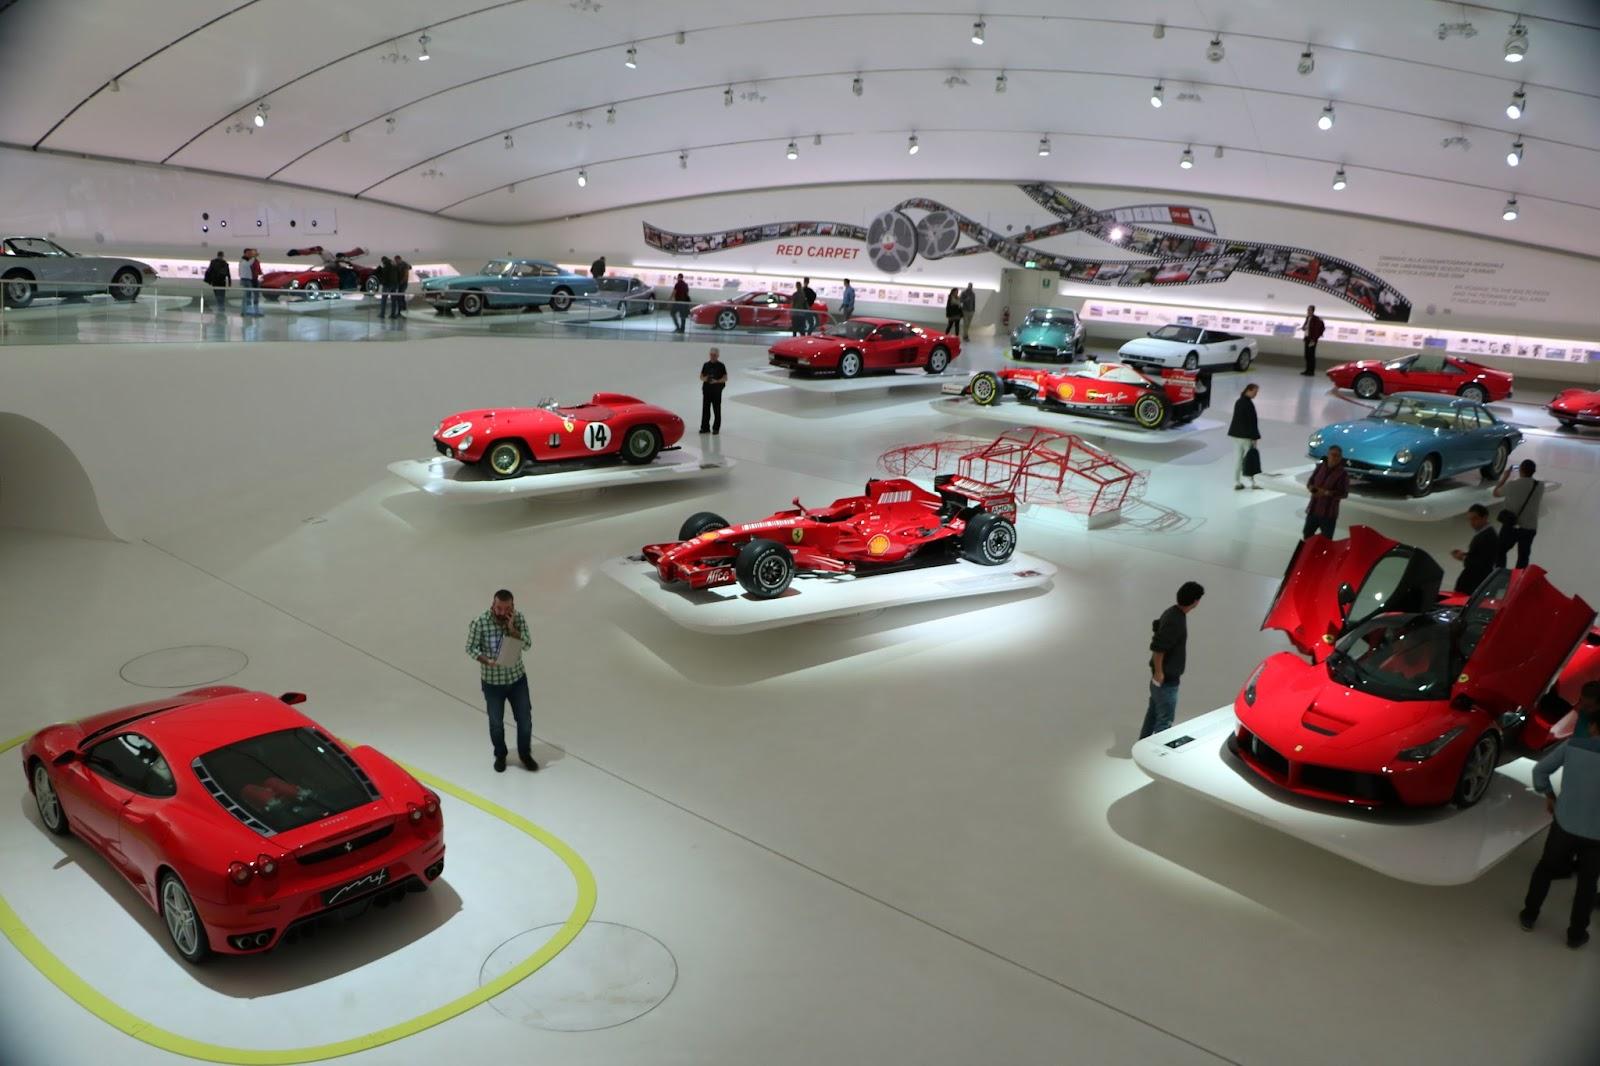 Modena - Enzo Museum 0126 - Floating Ferraris.jpg